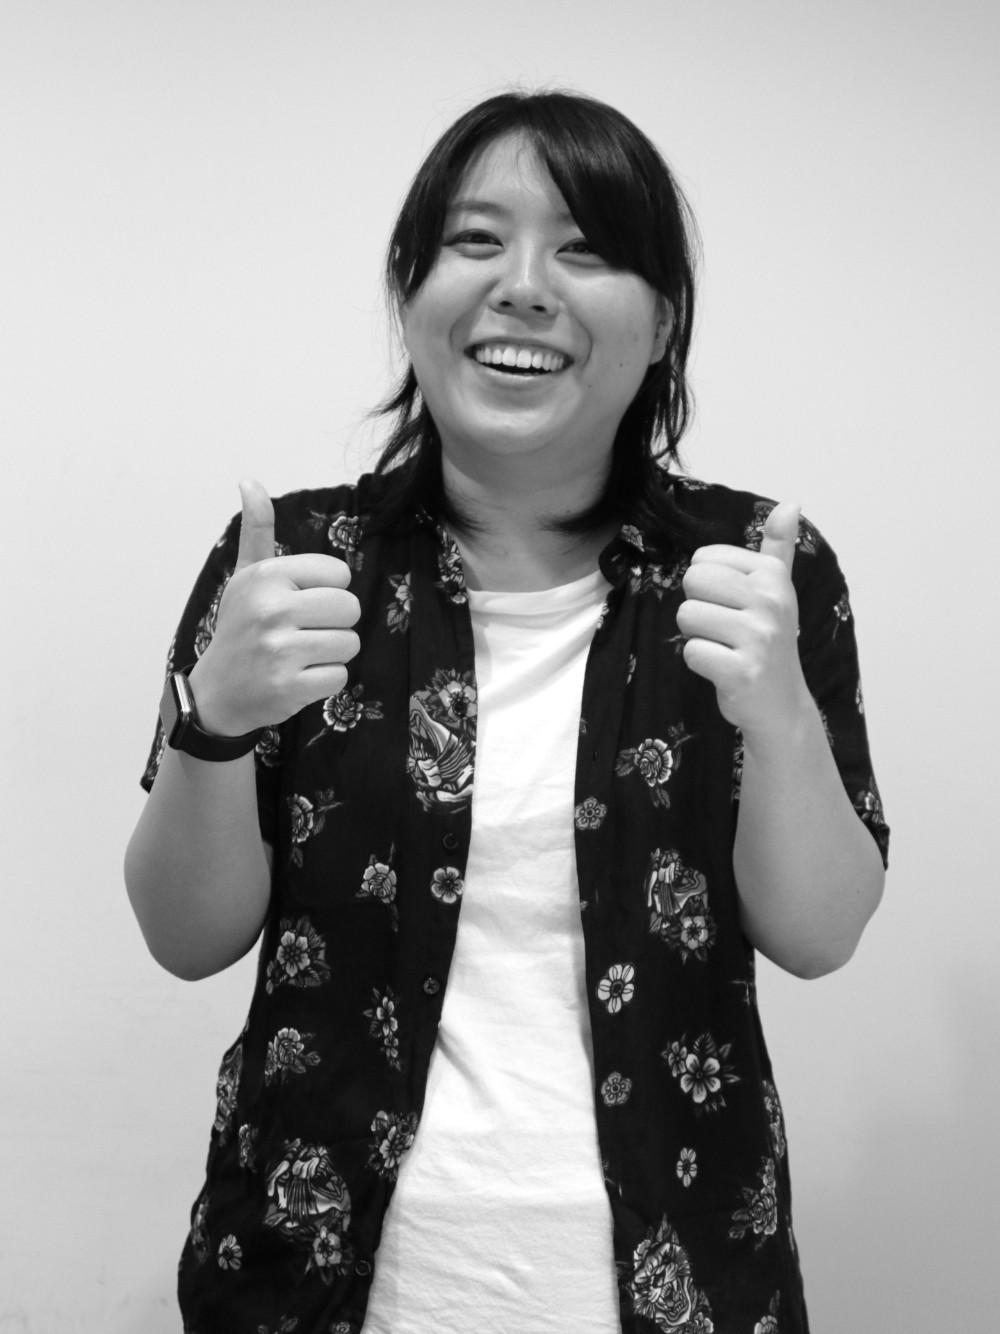 Mami Watanabe